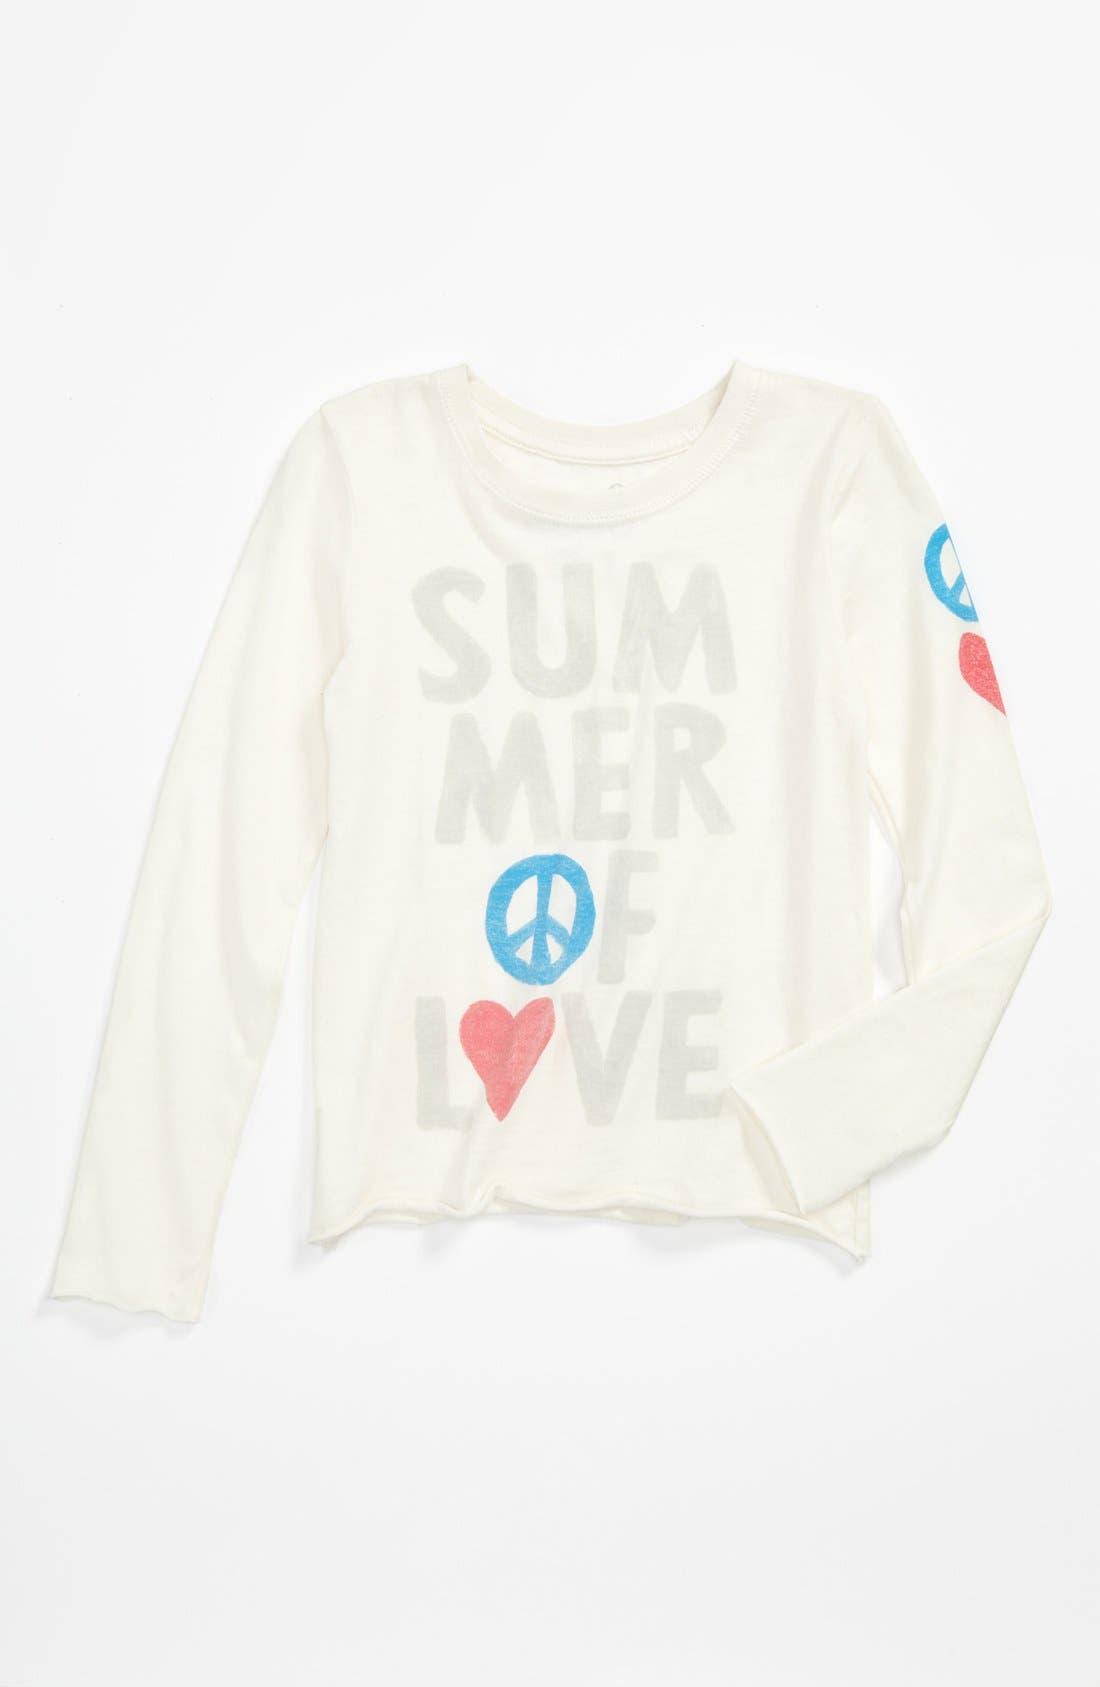 Alternate Image 1 Selected - Peek 'Summer of Love' Tee (Toddler, Little Girls & Big Girls)